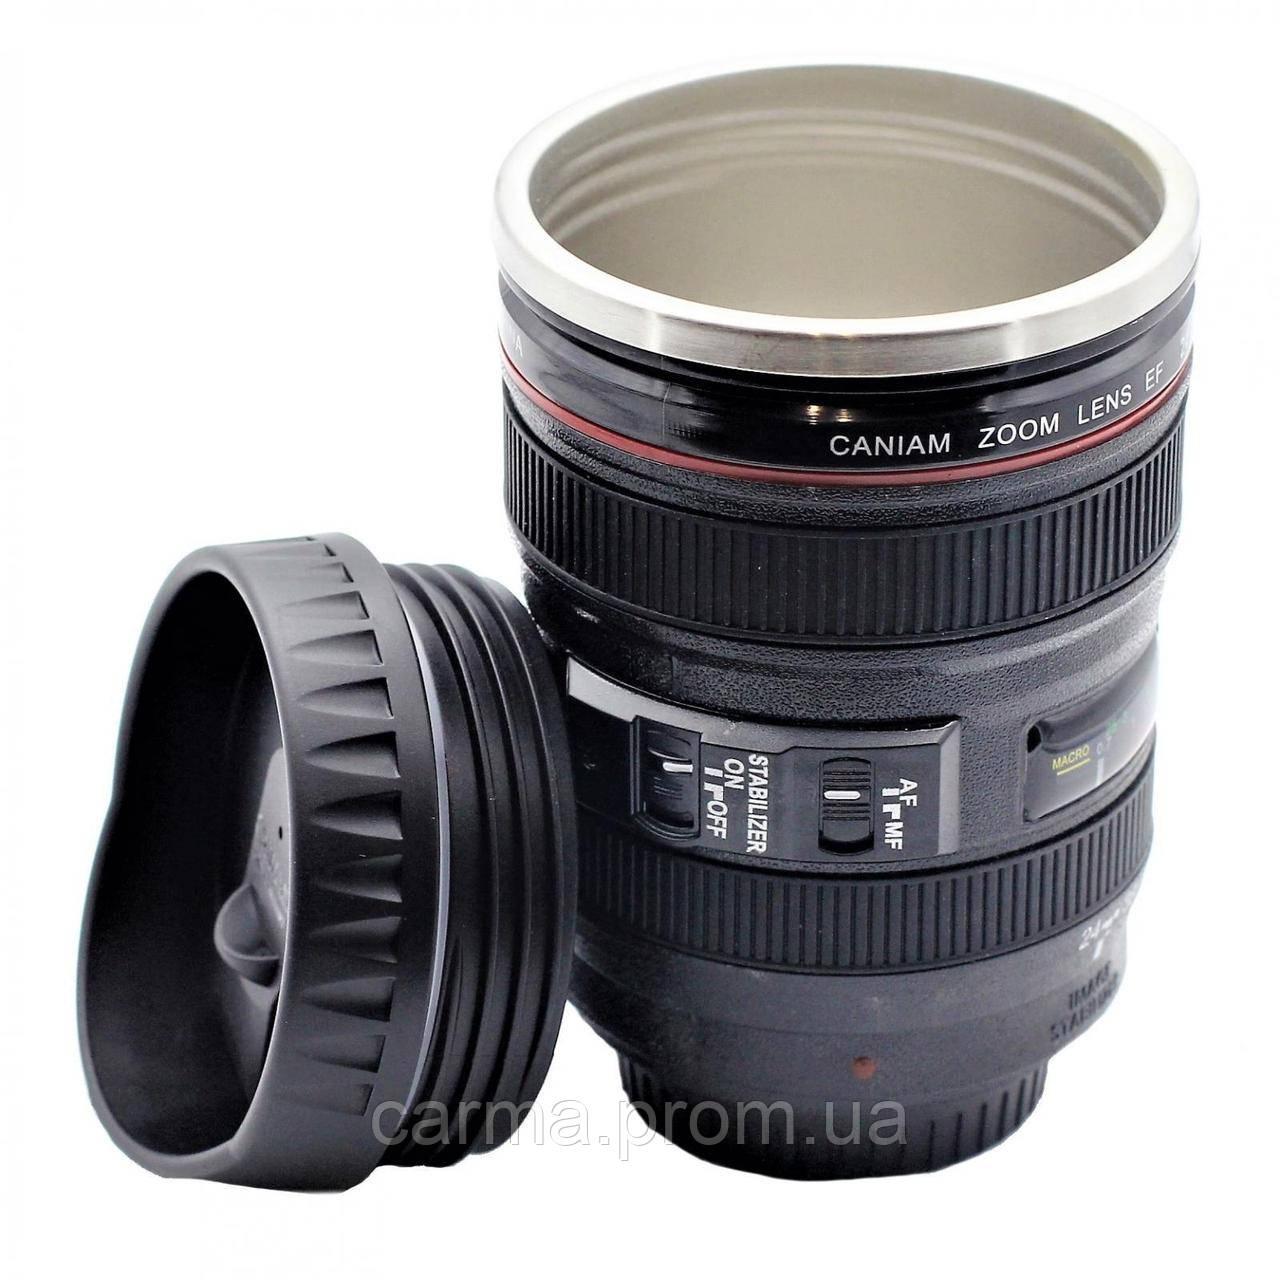 Термокружка чашка термос фотообъектив Caniam EF24-105mm